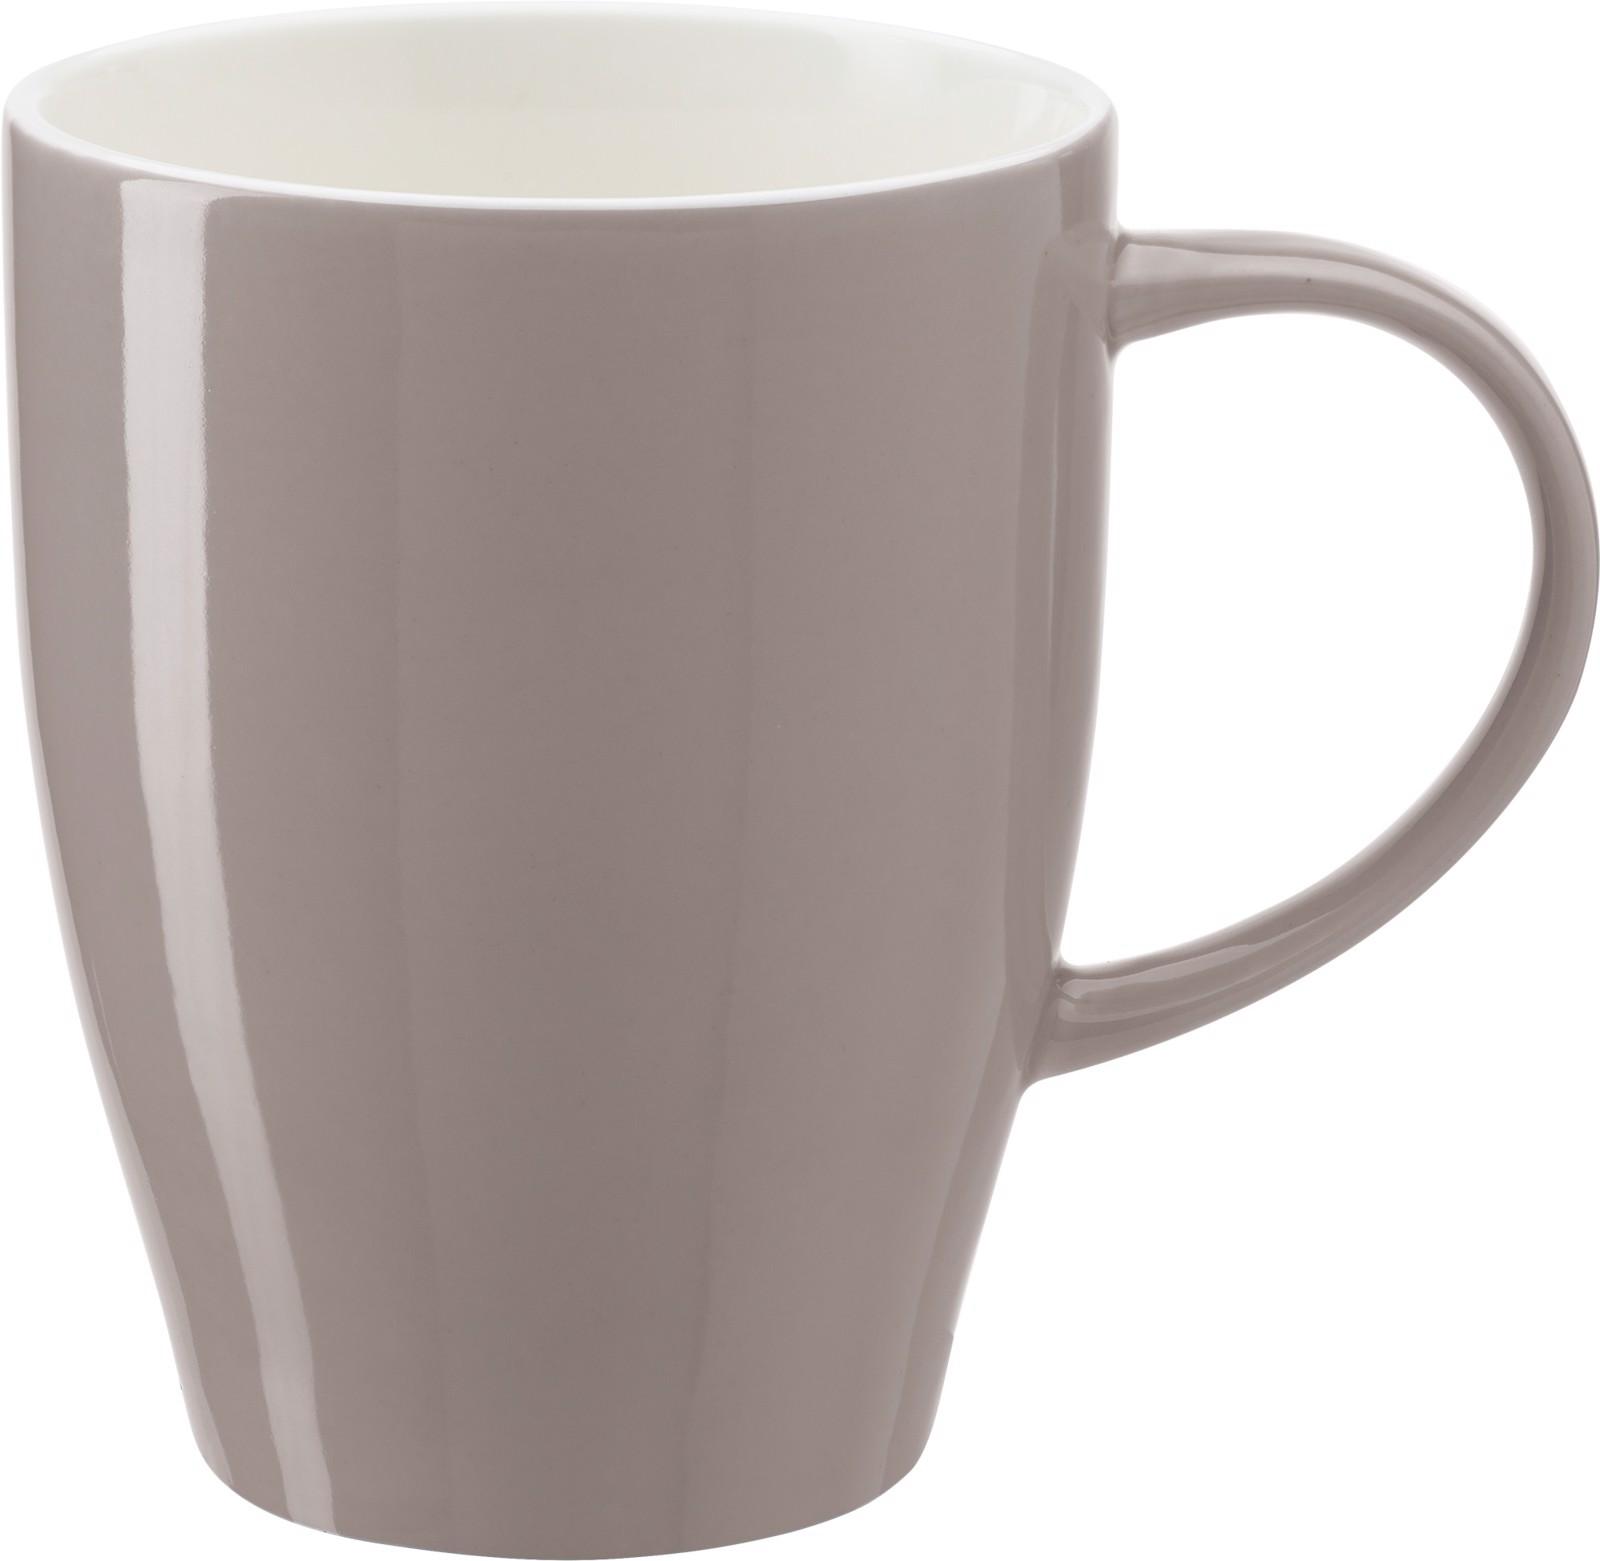 Porcelain mug - Grey